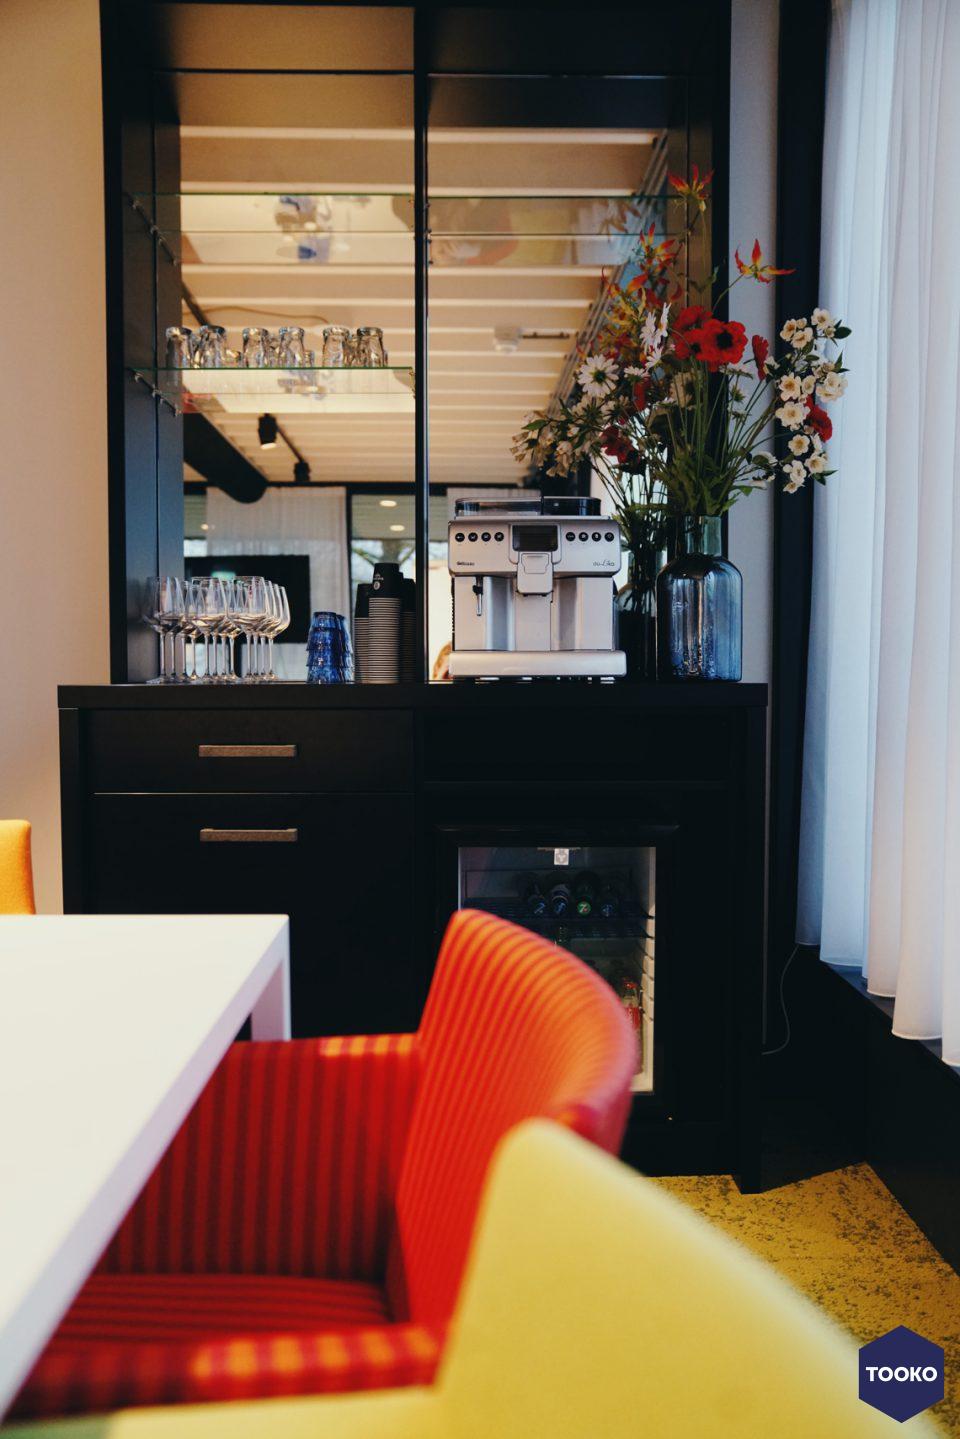 Delade Interieurbouw - Interieur restaurant De Steck